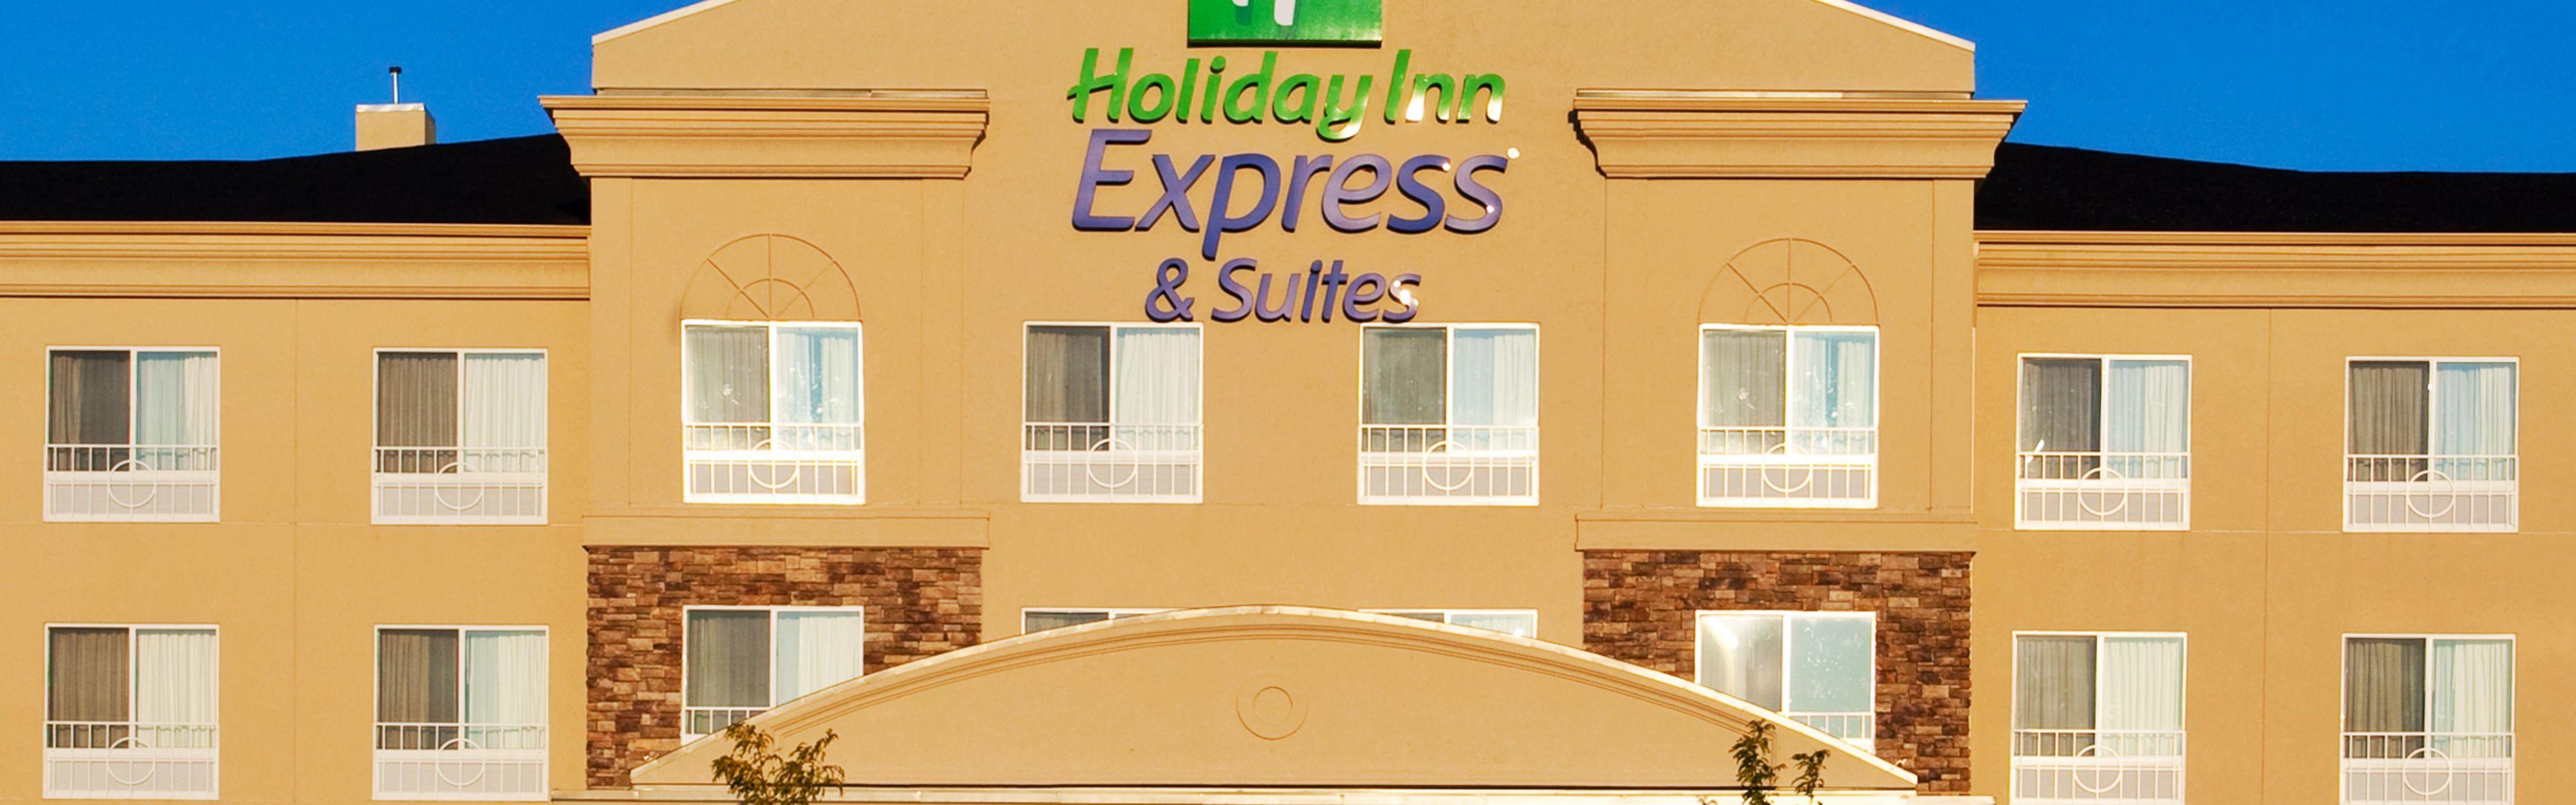 Holiday Inn Express & Suites Chicago North-Waukegan-Gurnee image 0